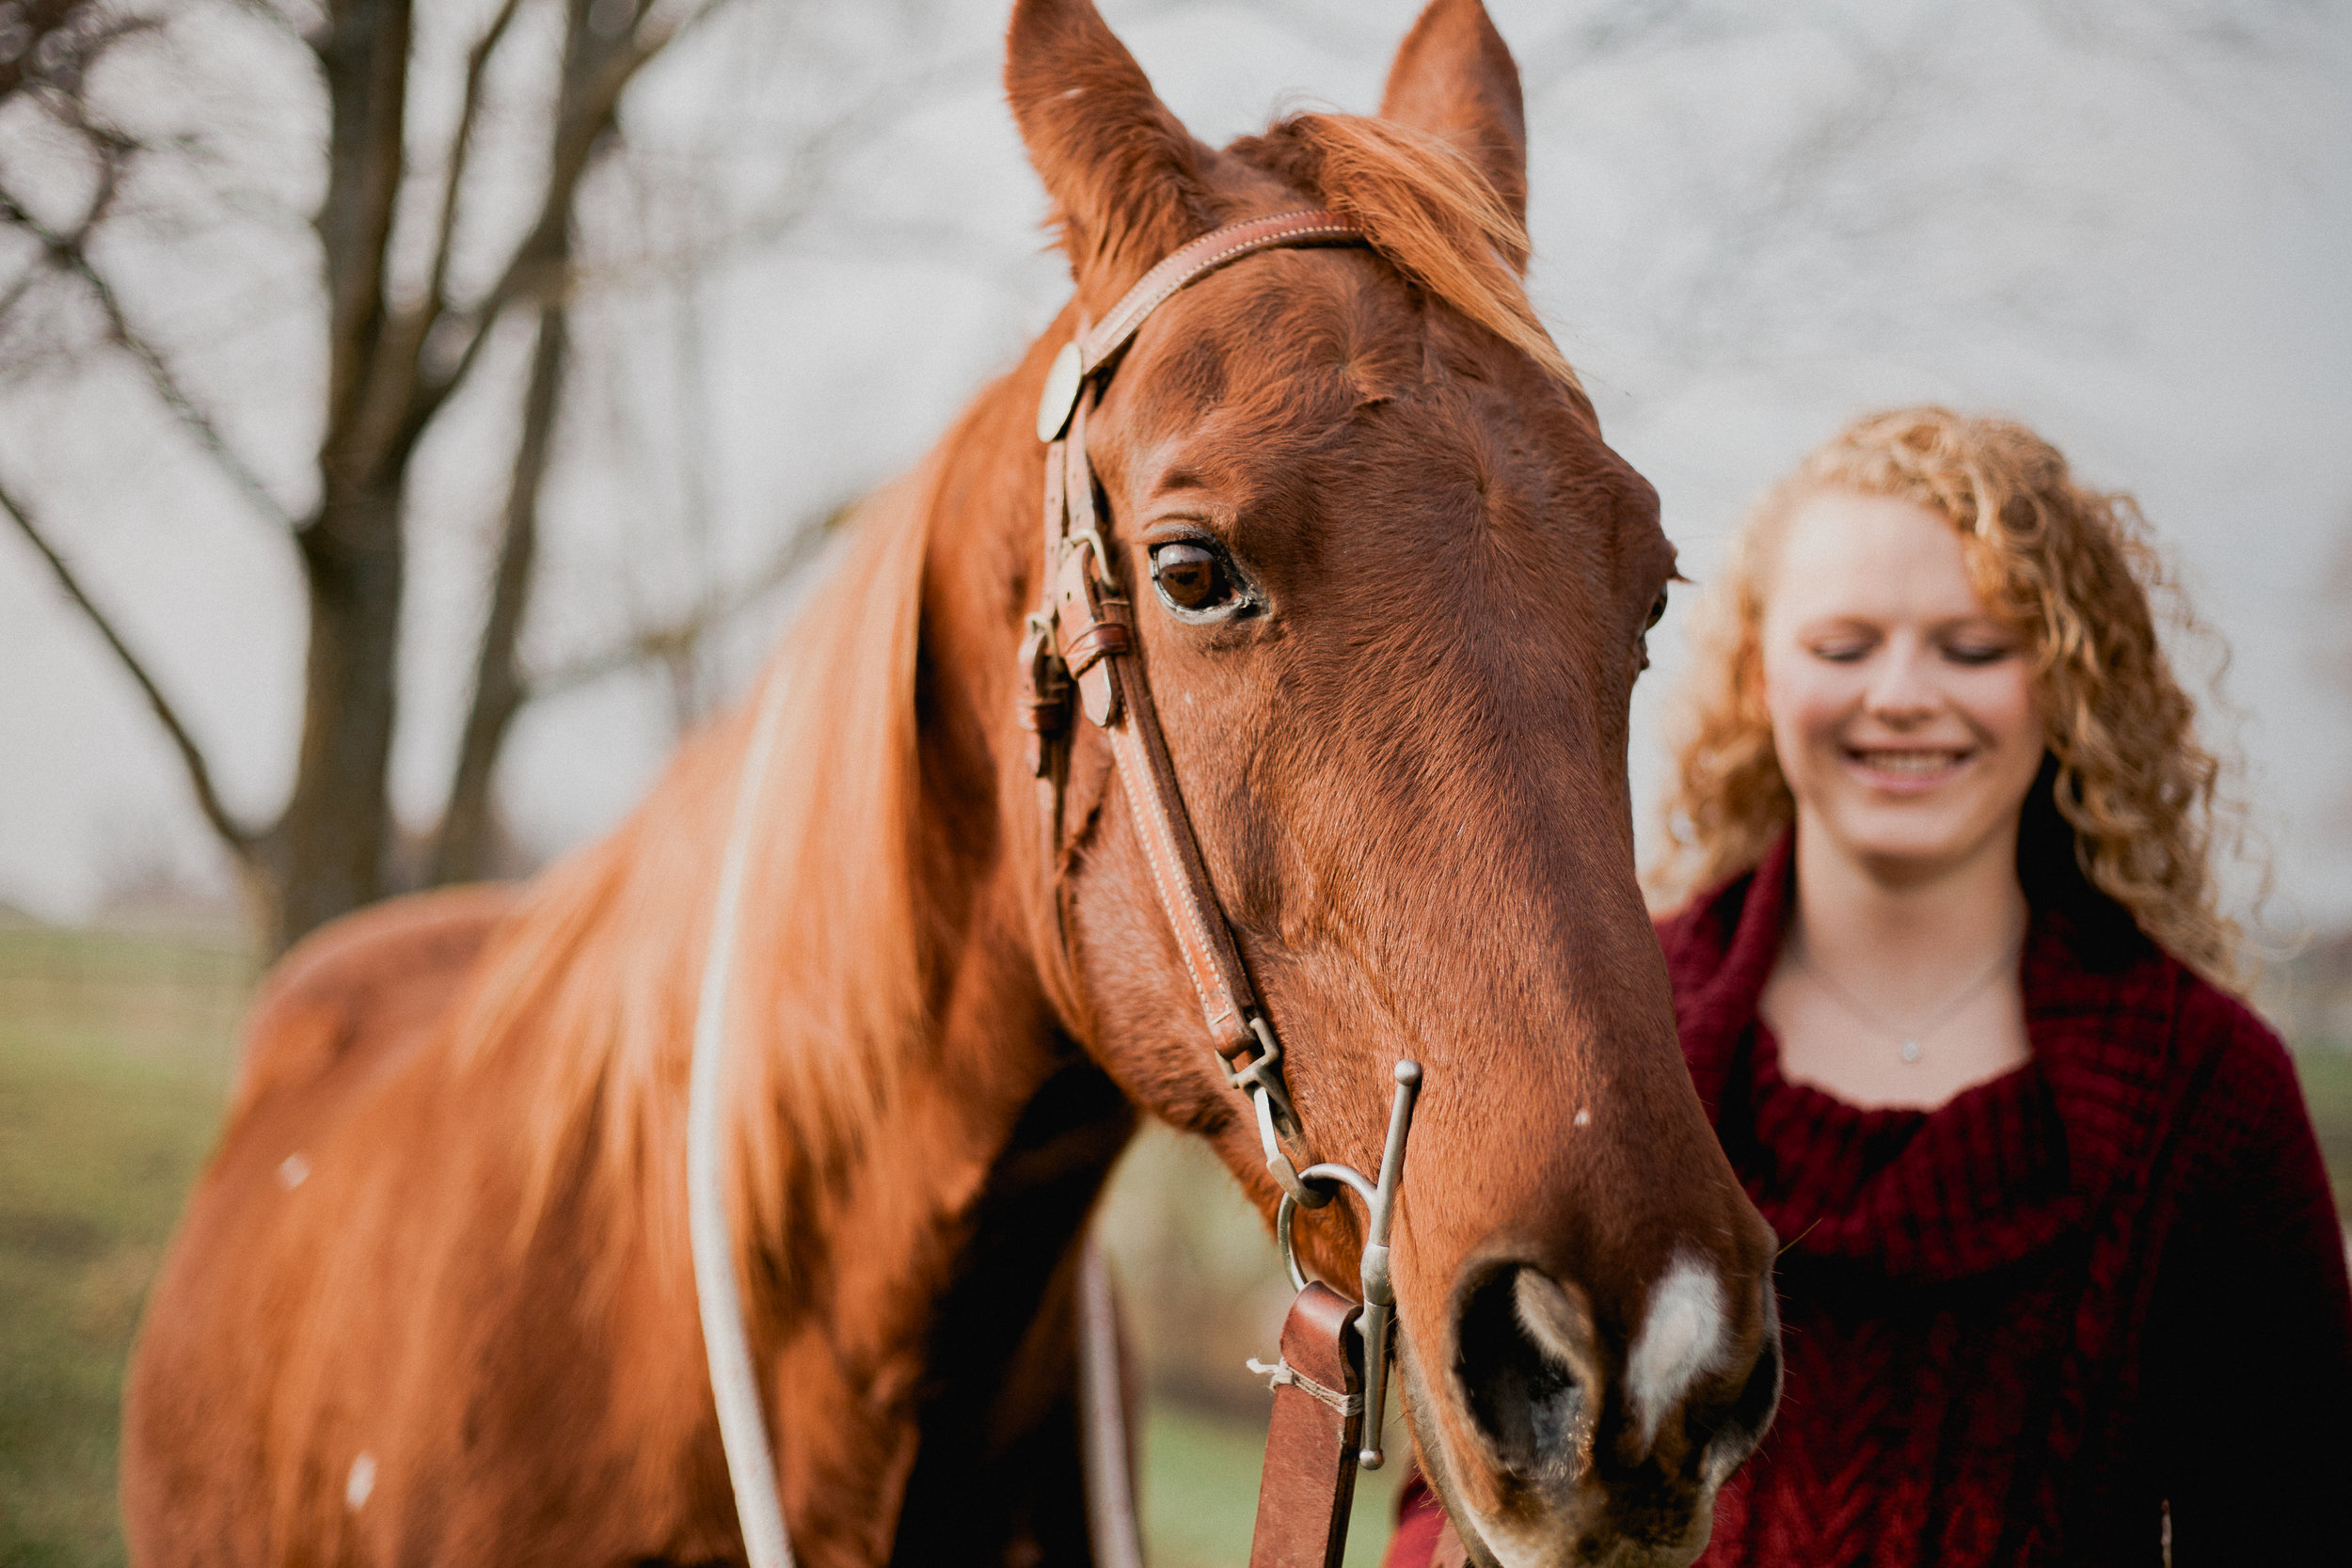 Kansas City Senior Photography with Horse by Merry Ohler